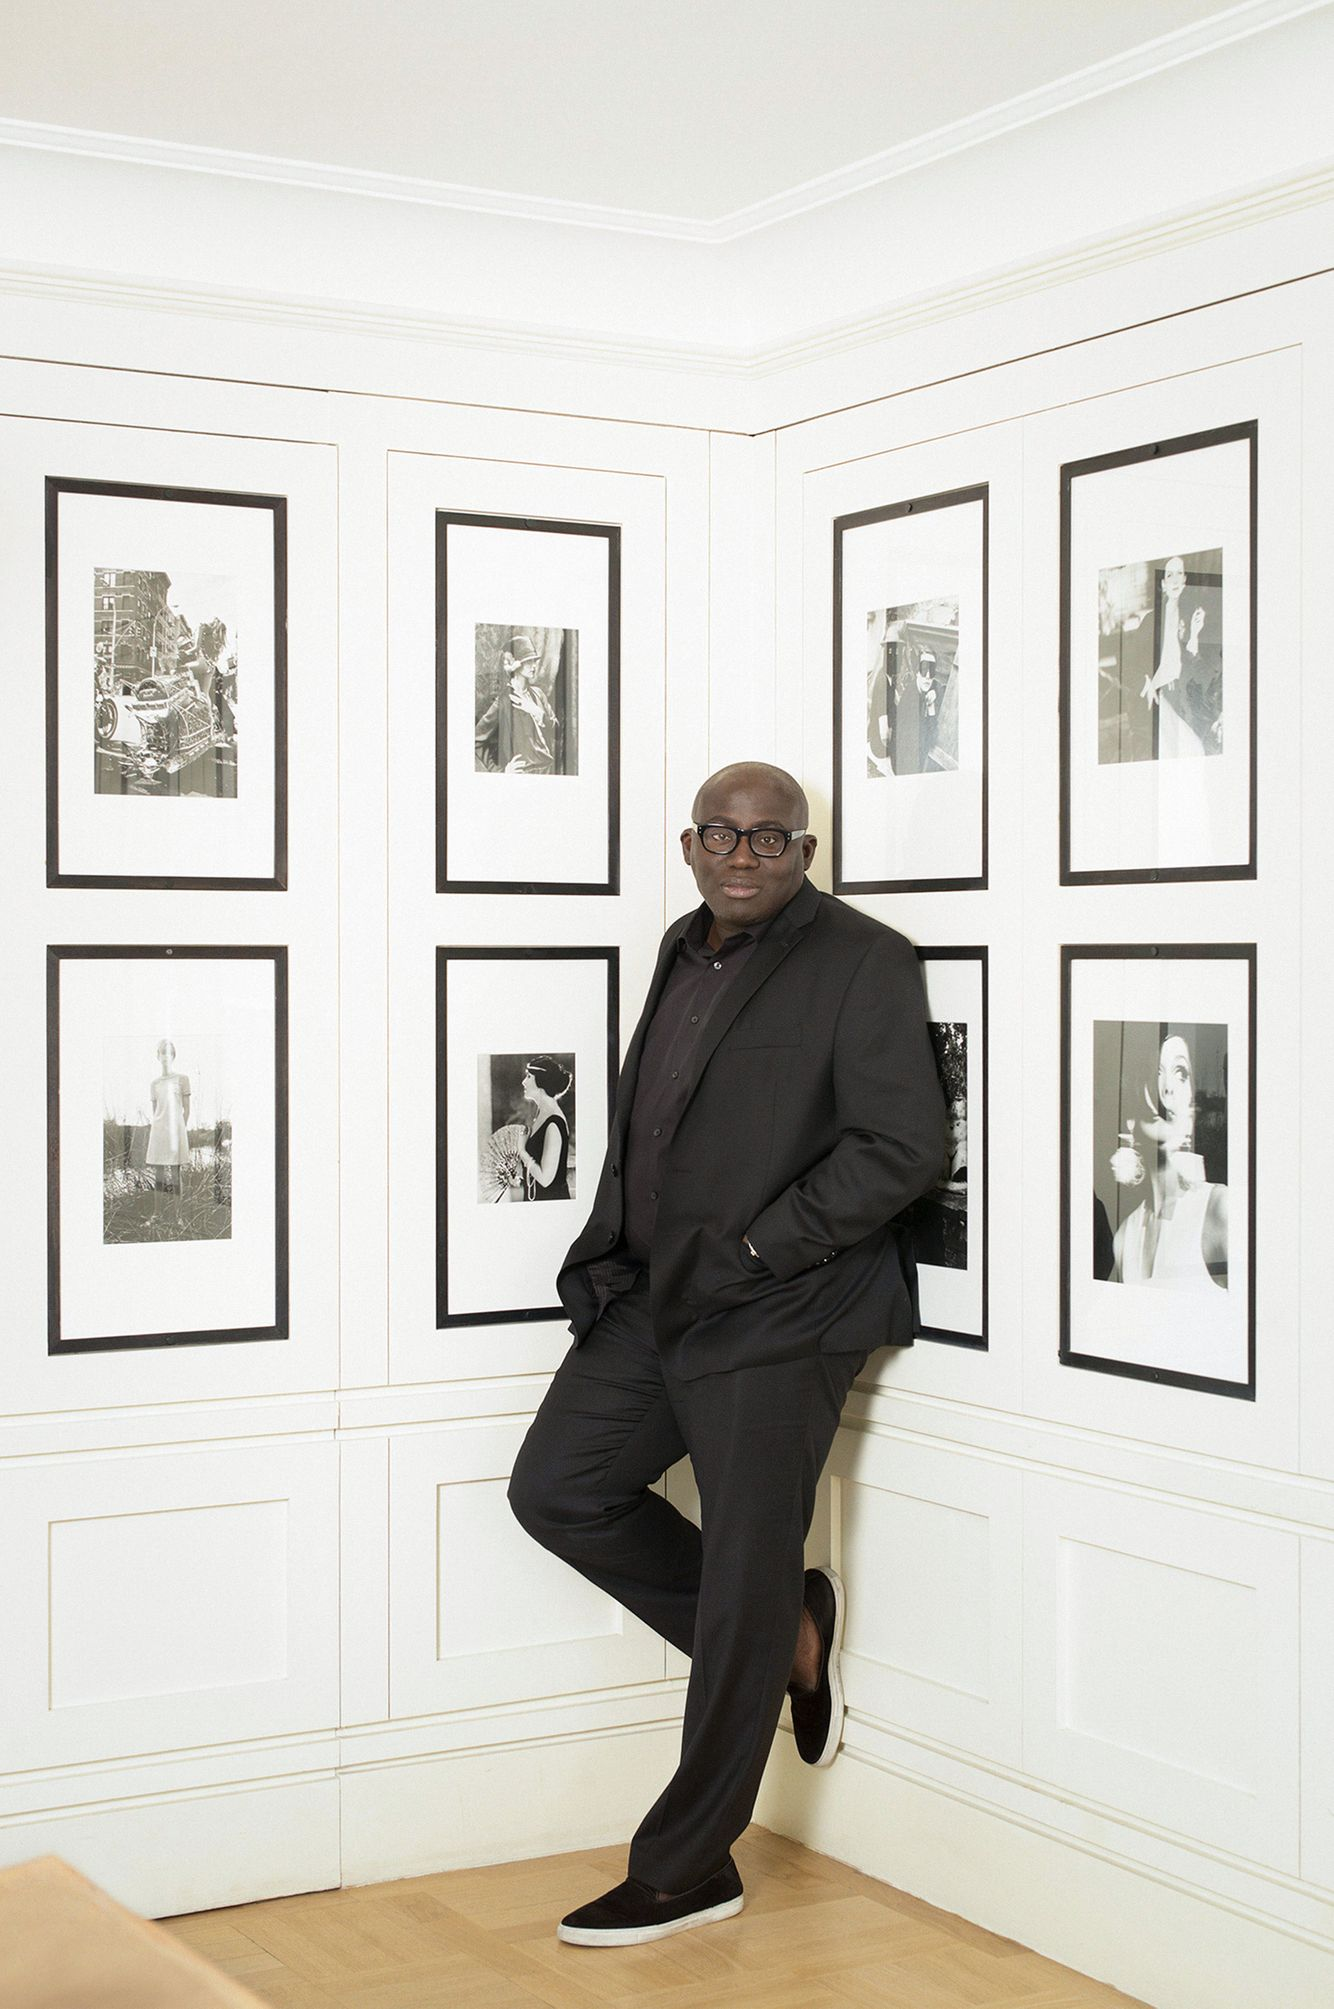 Edward Enninful Editor of British Vogue